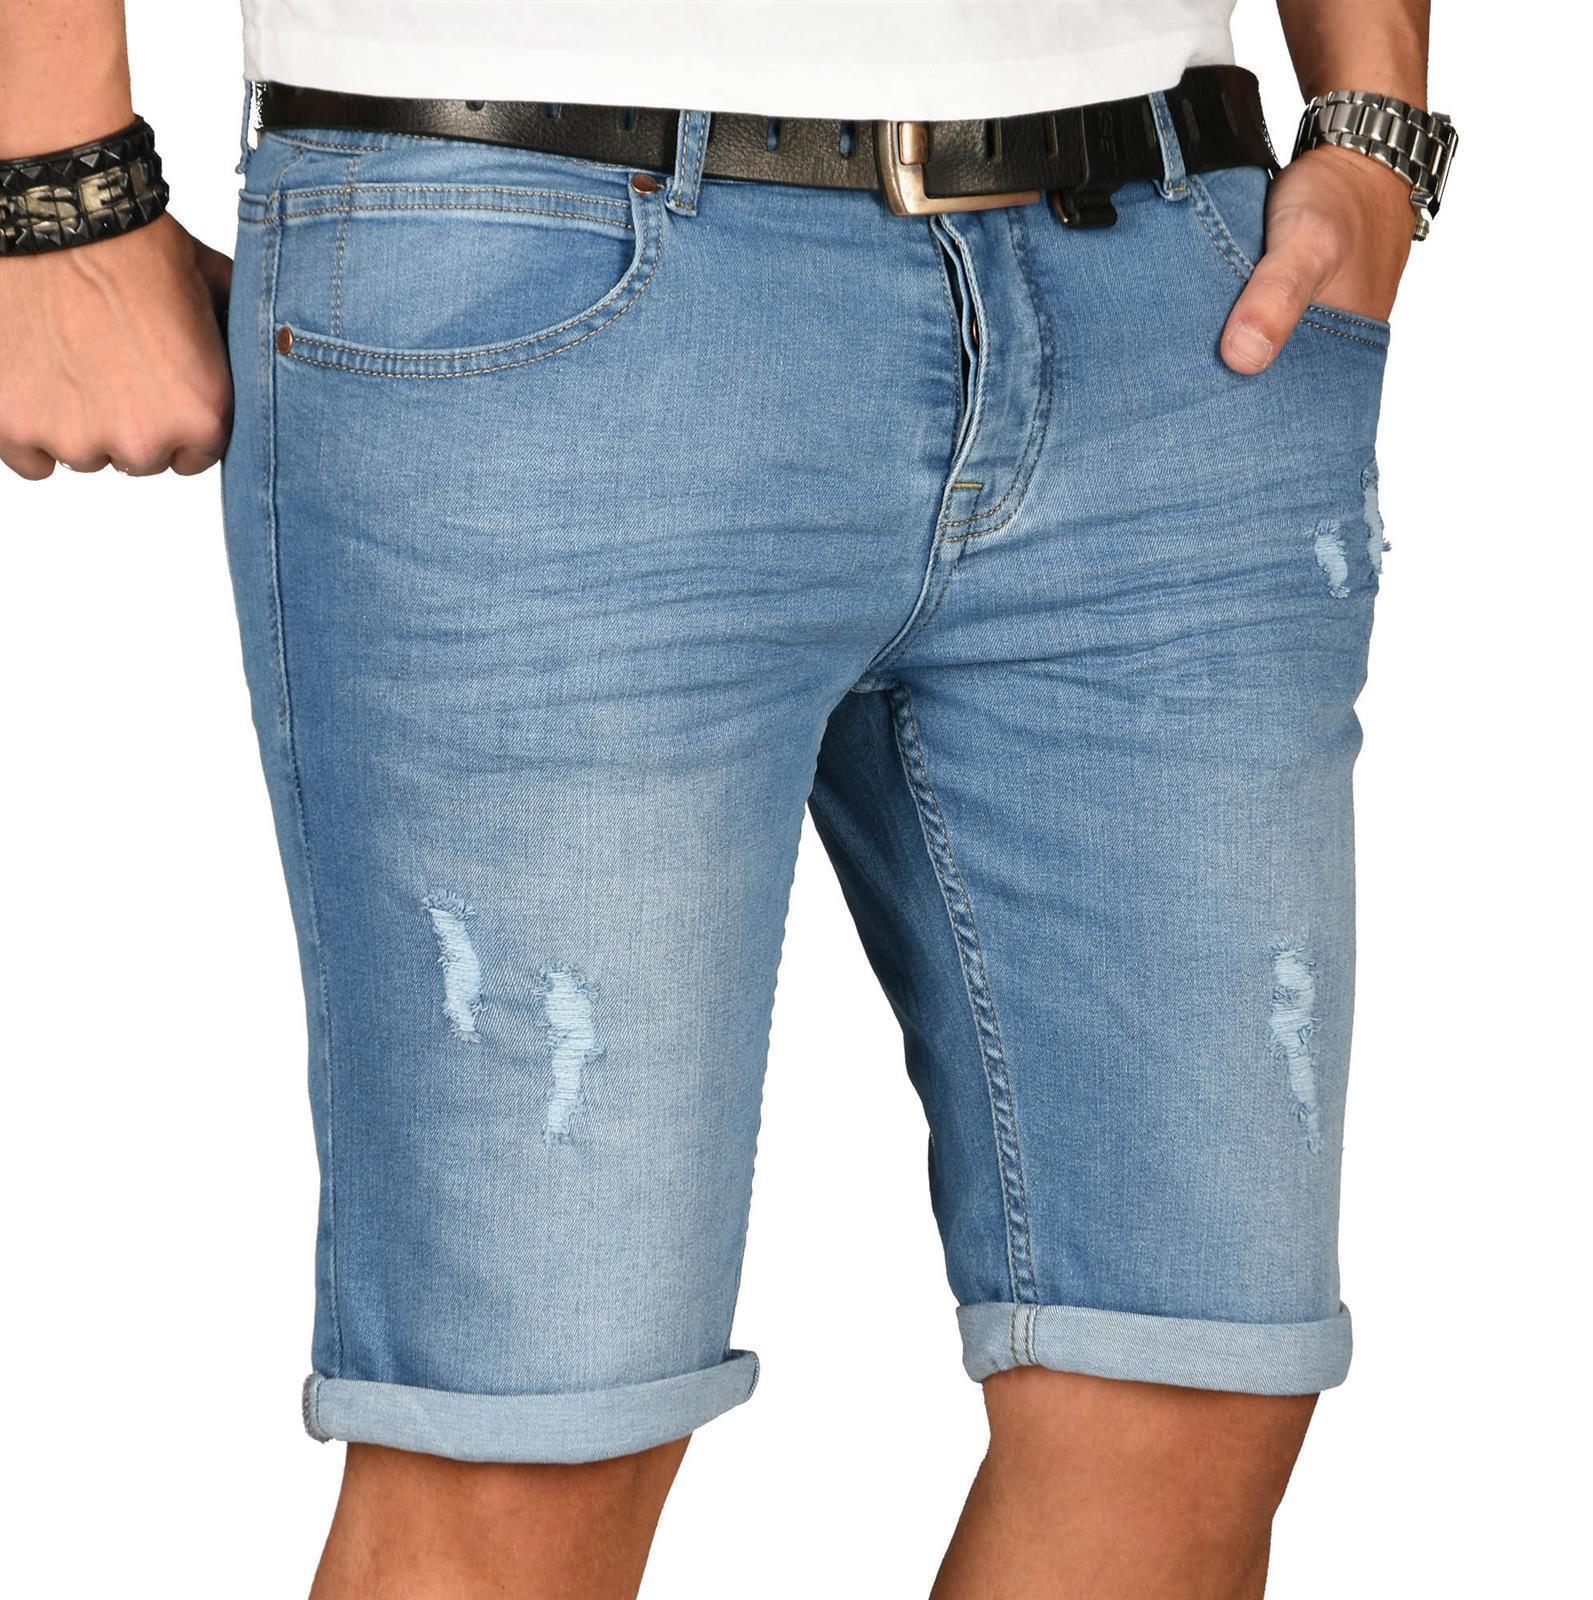 A-Salvarini-Herren-Designer-Jeans-Short-kurze-Hose-Slim-Sommer-Shorts-Washed Indexbild 19